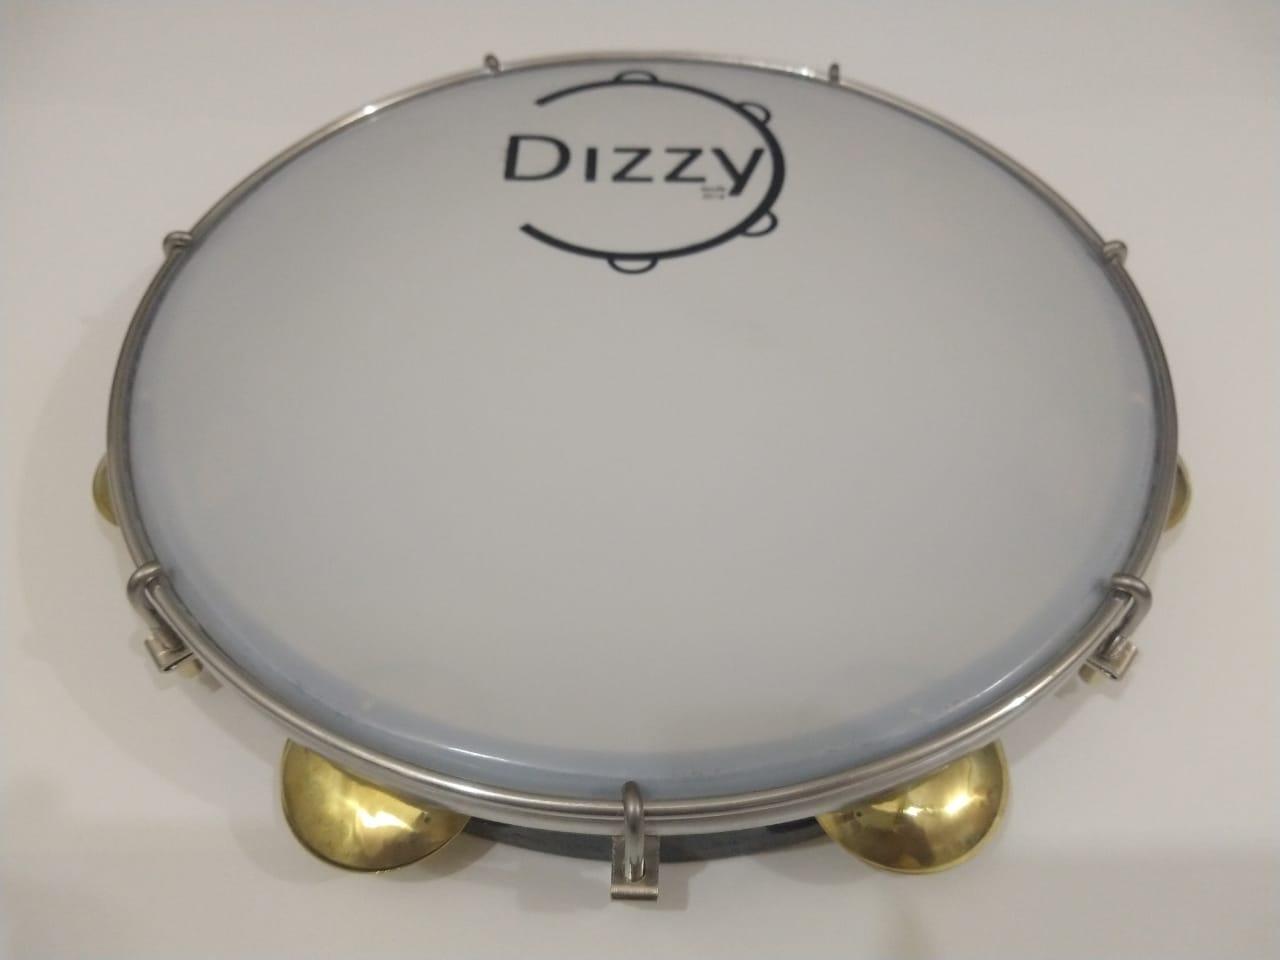 Pandeiro Dizzy 11 Pol Super Leve Marrom Escuro